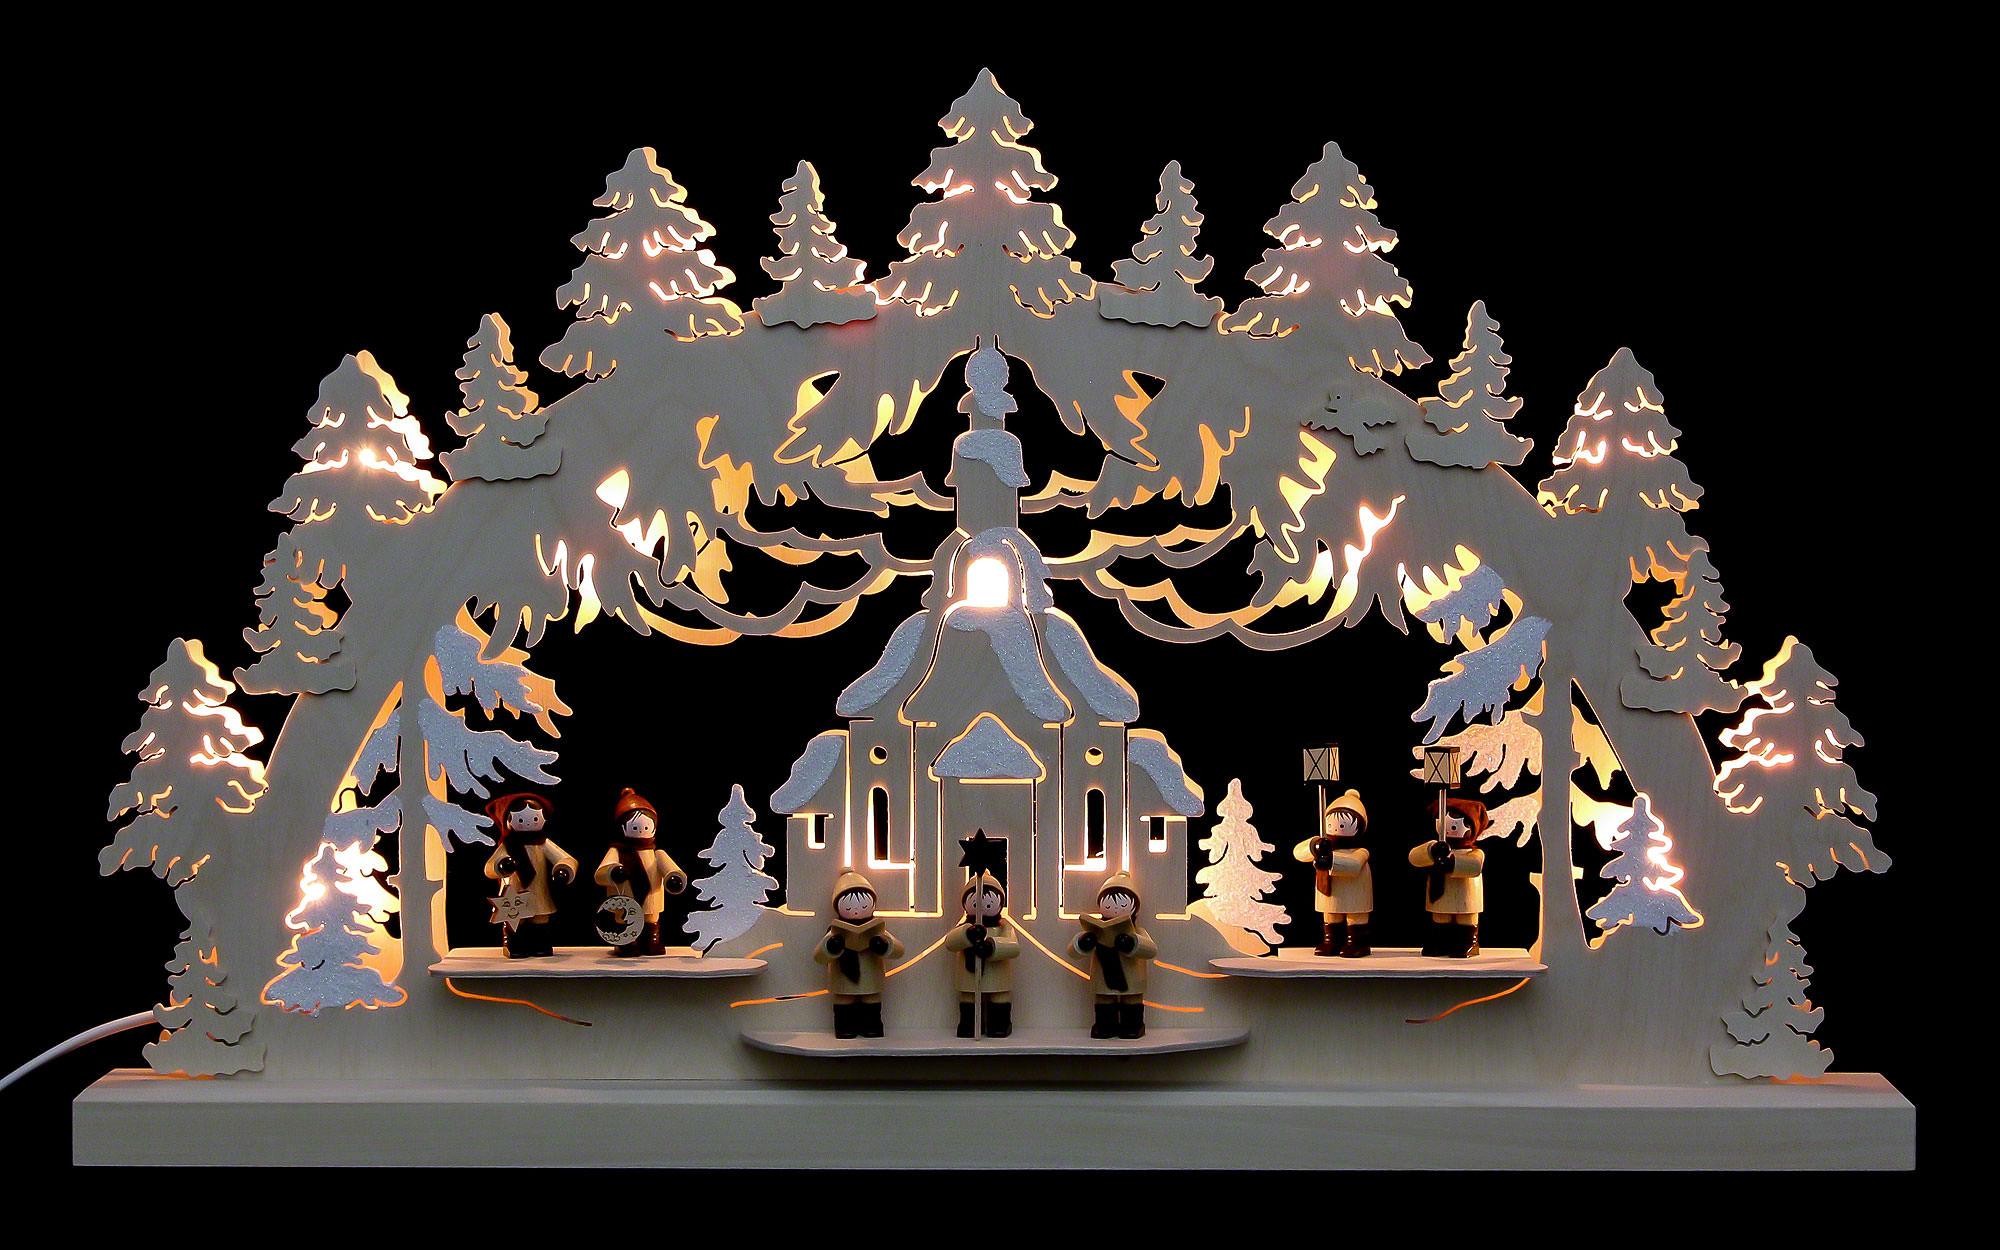 3d doppelschwibbogen seiffener kirche 62x37x5 5cm von michael m ller. Black Bedroom Furniture Sets. Home Design Ideas